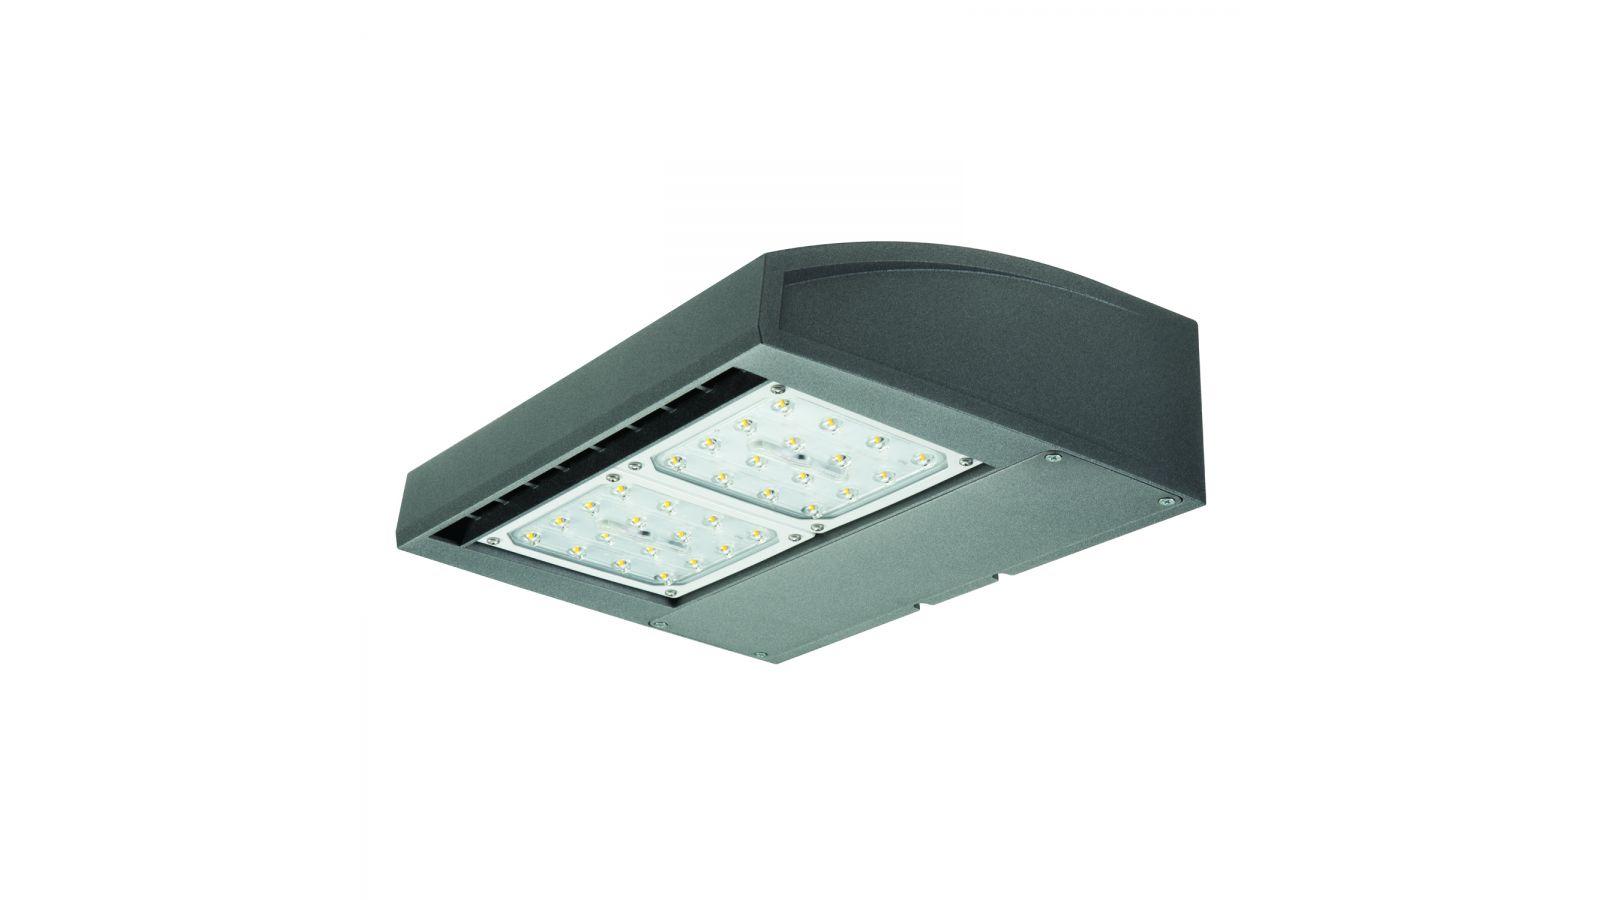 McGraw-Edison Galleon LED Wall Luminaire